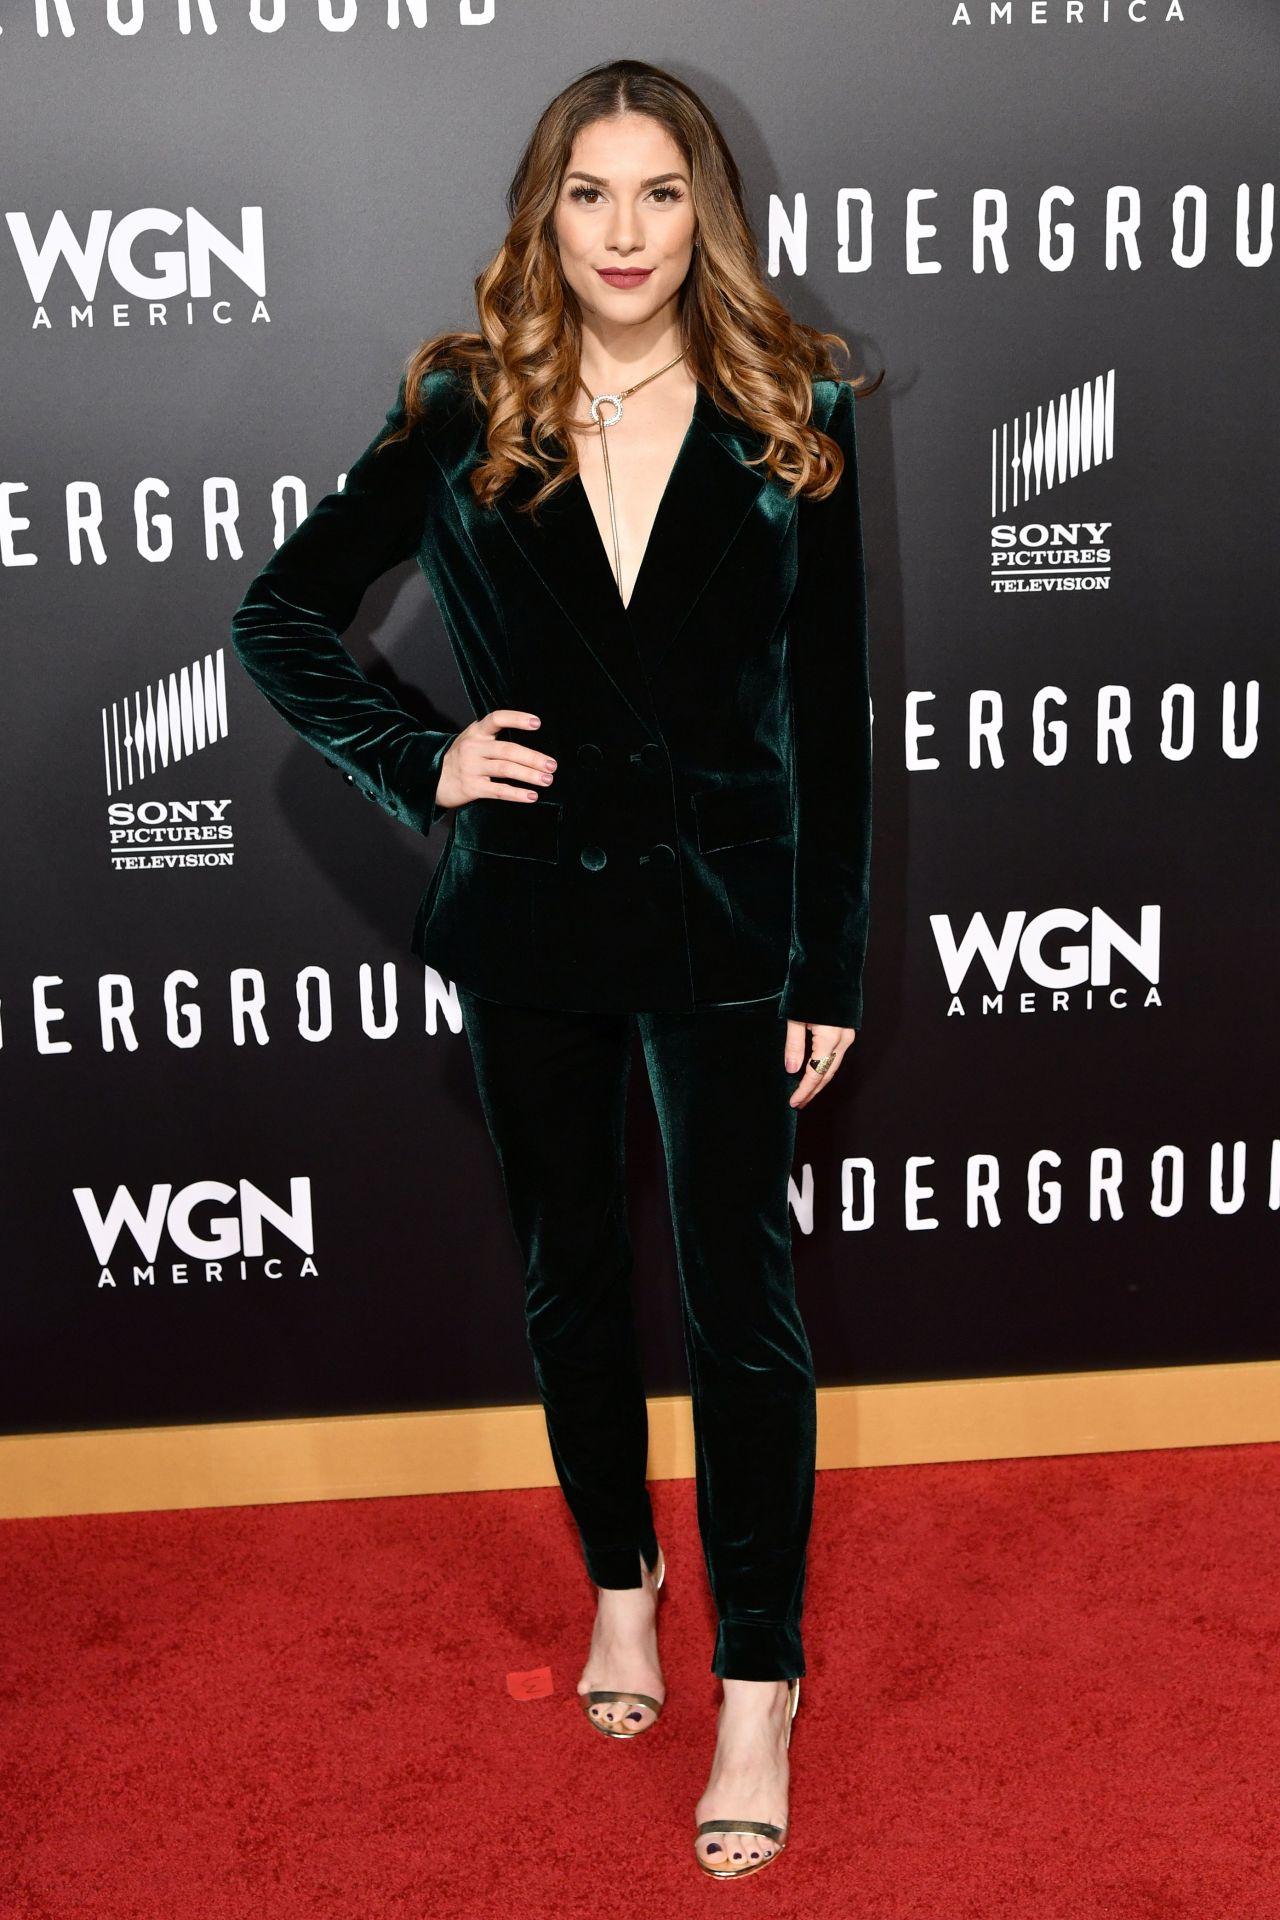 Allison holker at underground tv series season 2 premiere in los angeles